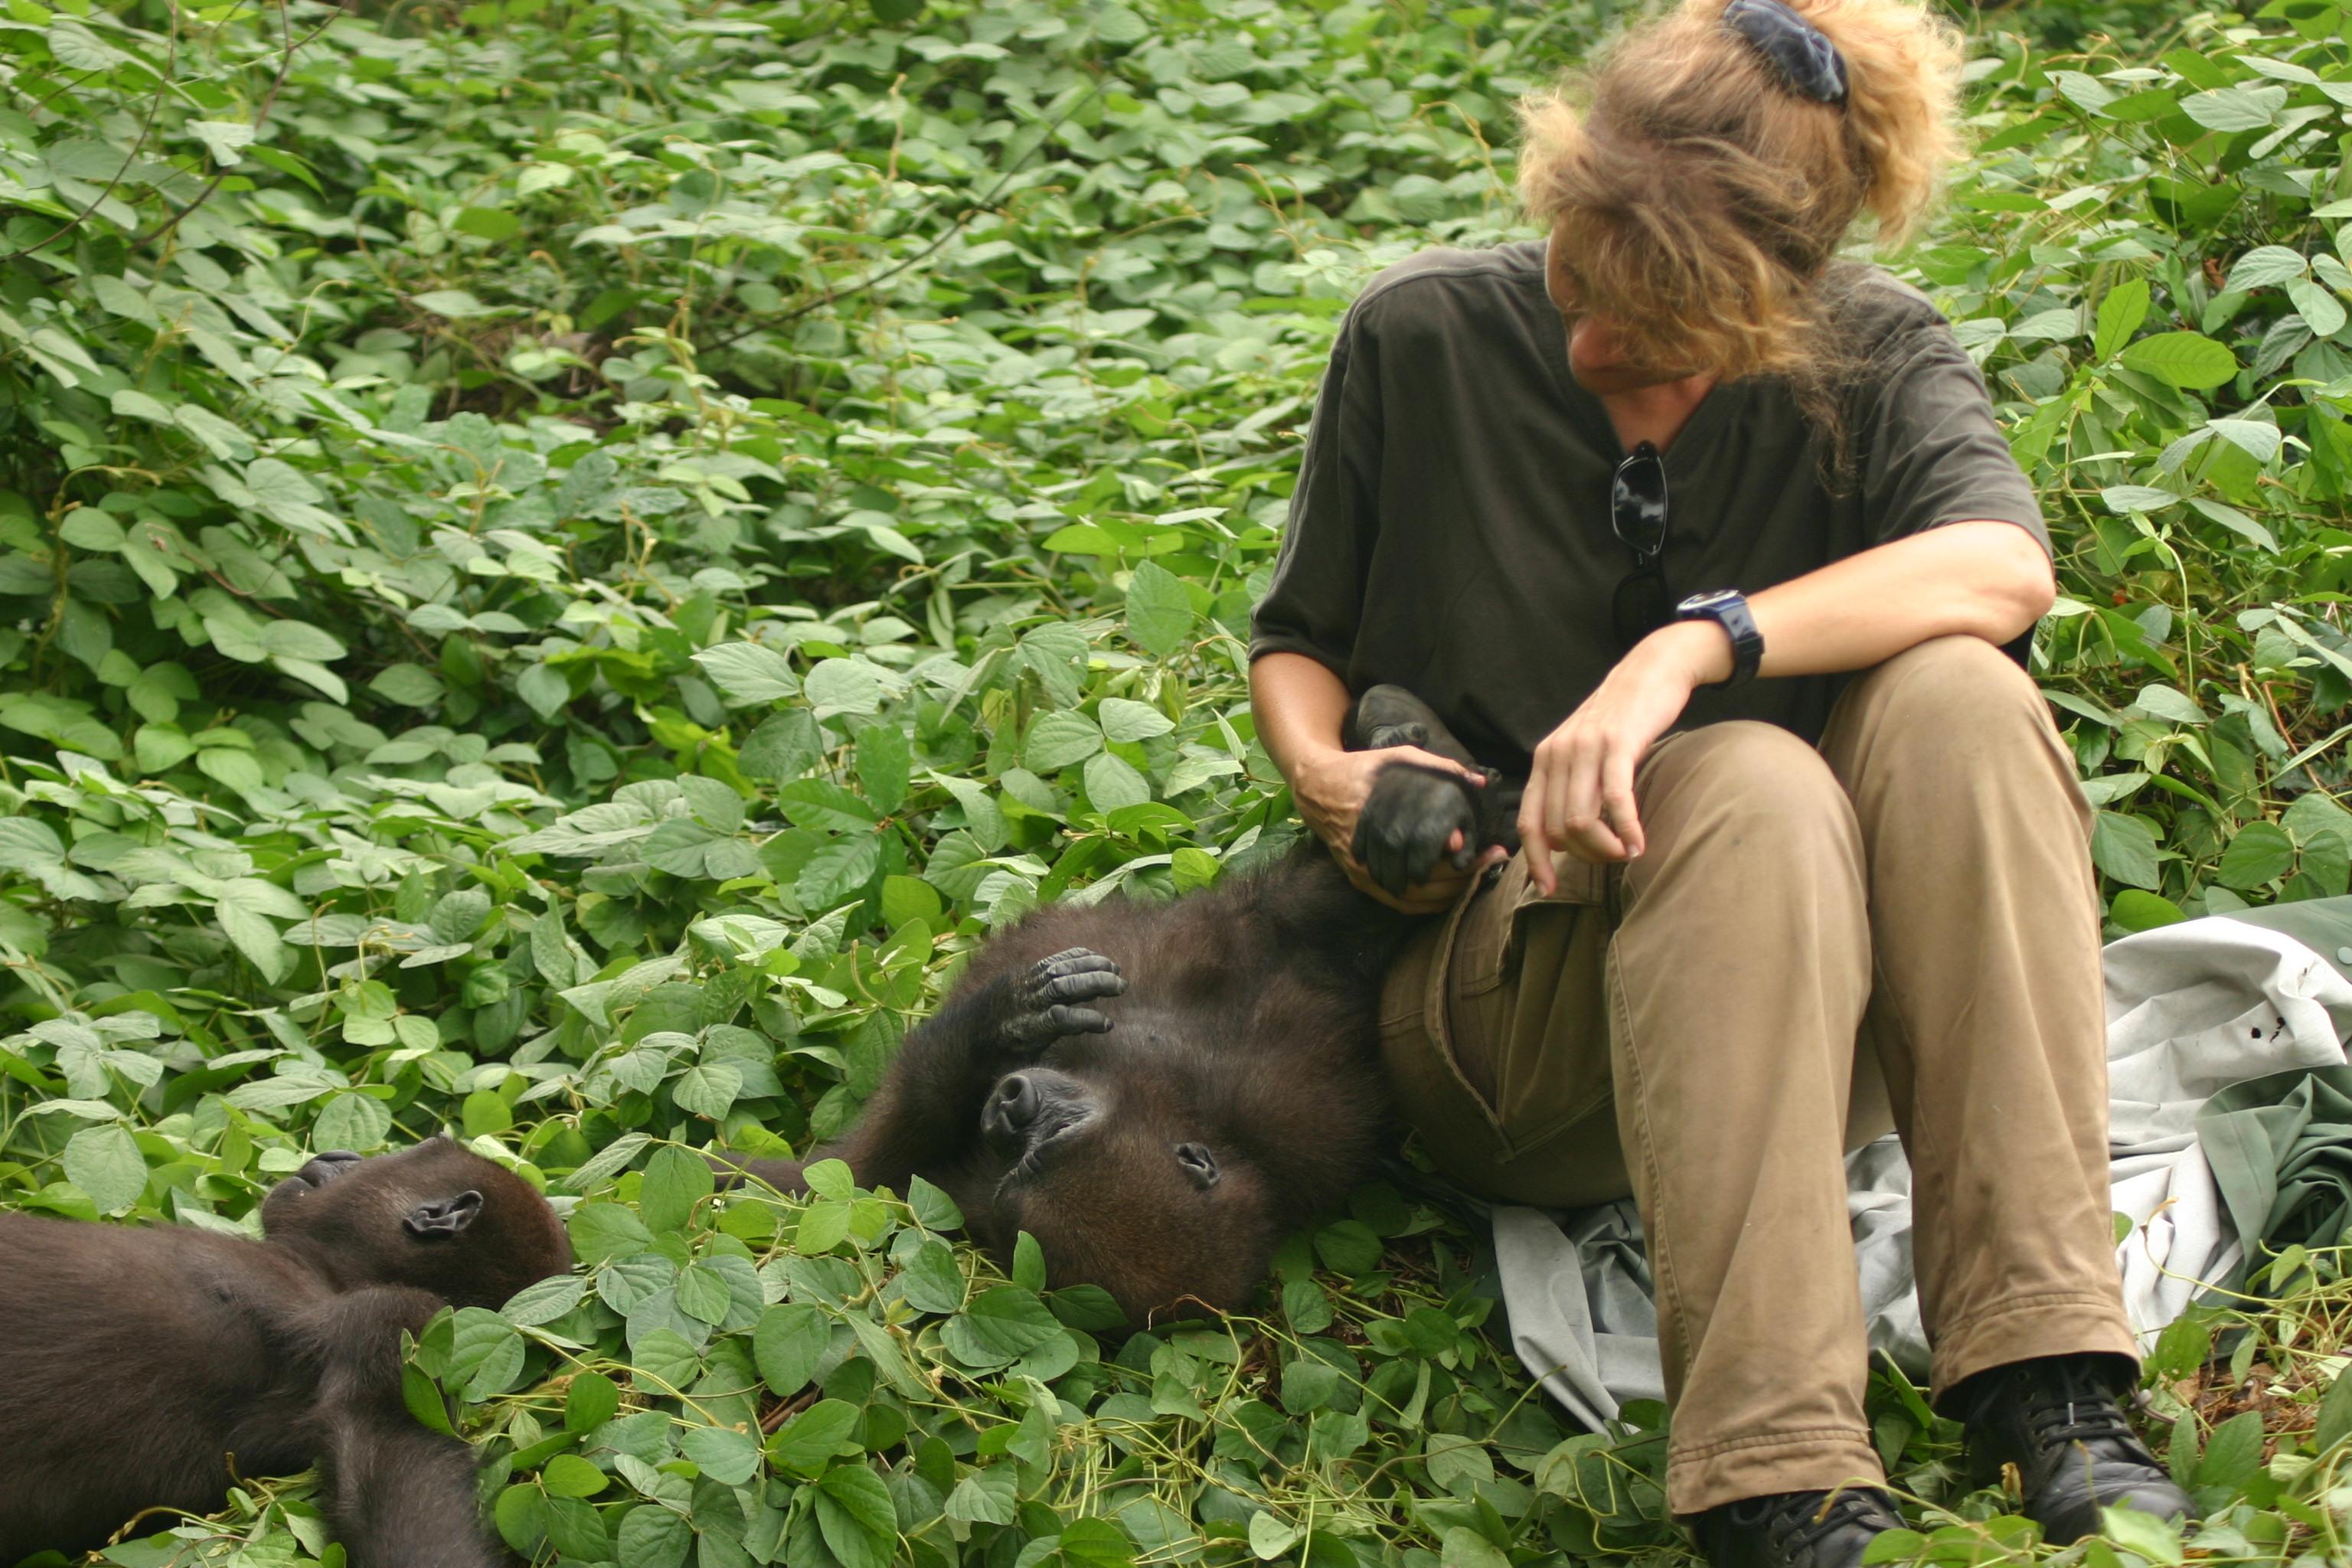 Astrid et gorilles dans la forêt